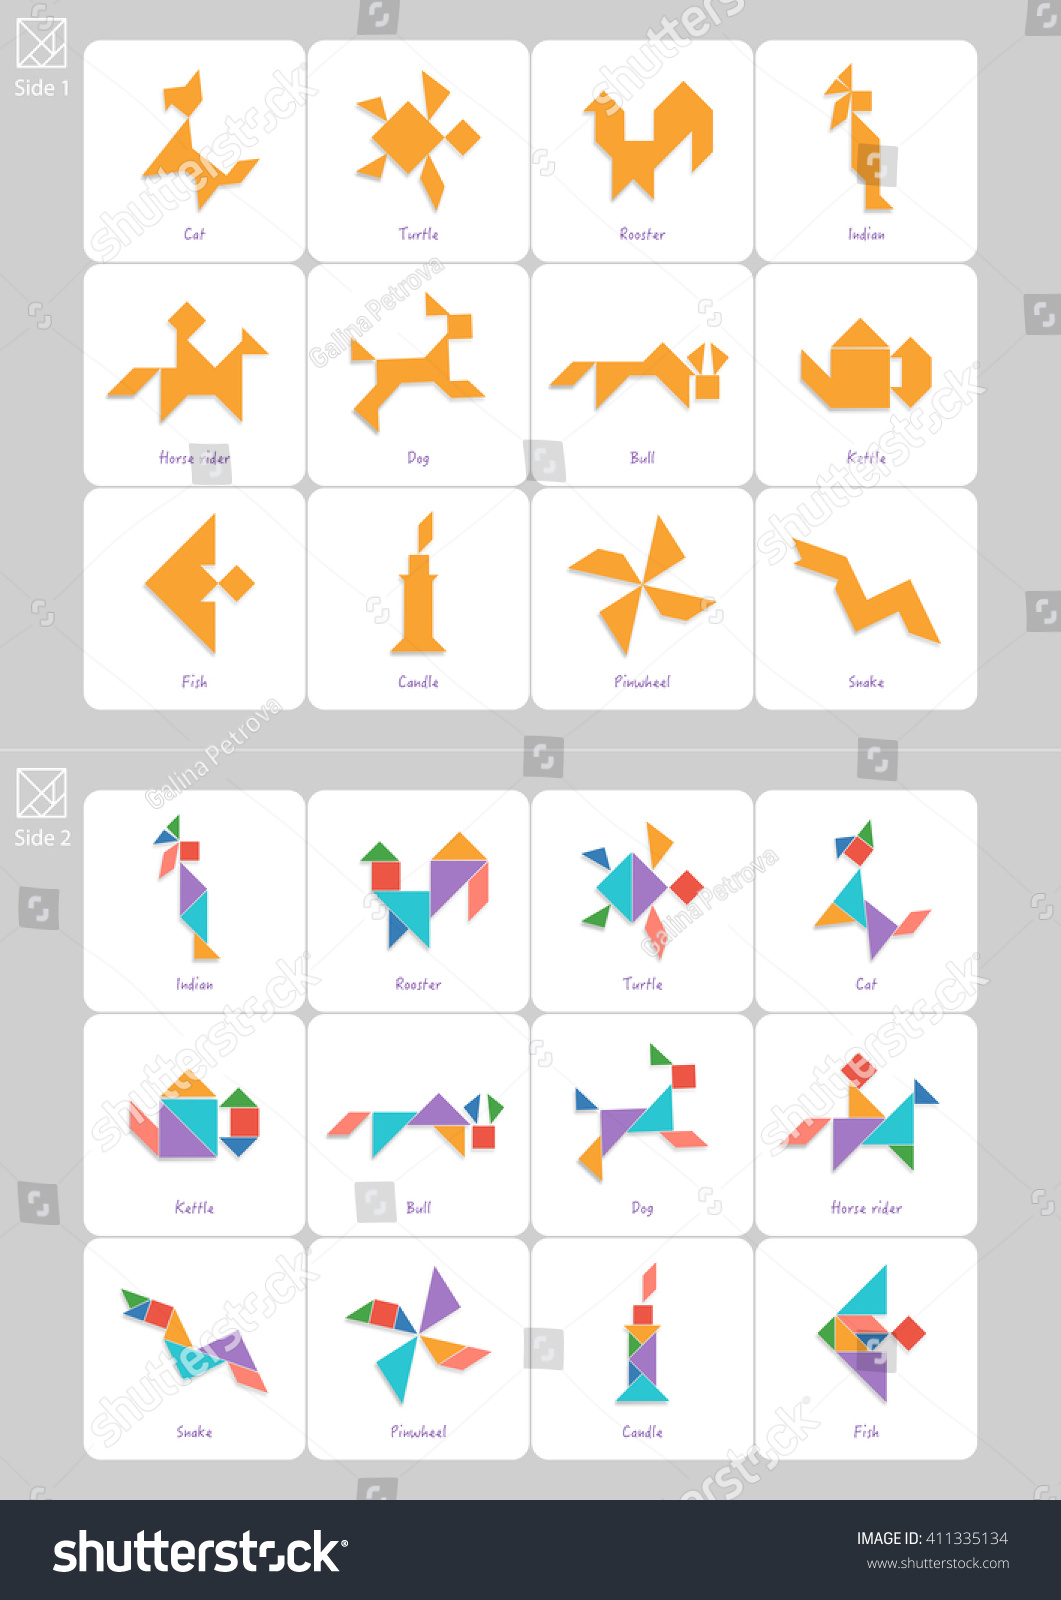 tangram set task solution cards captions のベクター画像素材